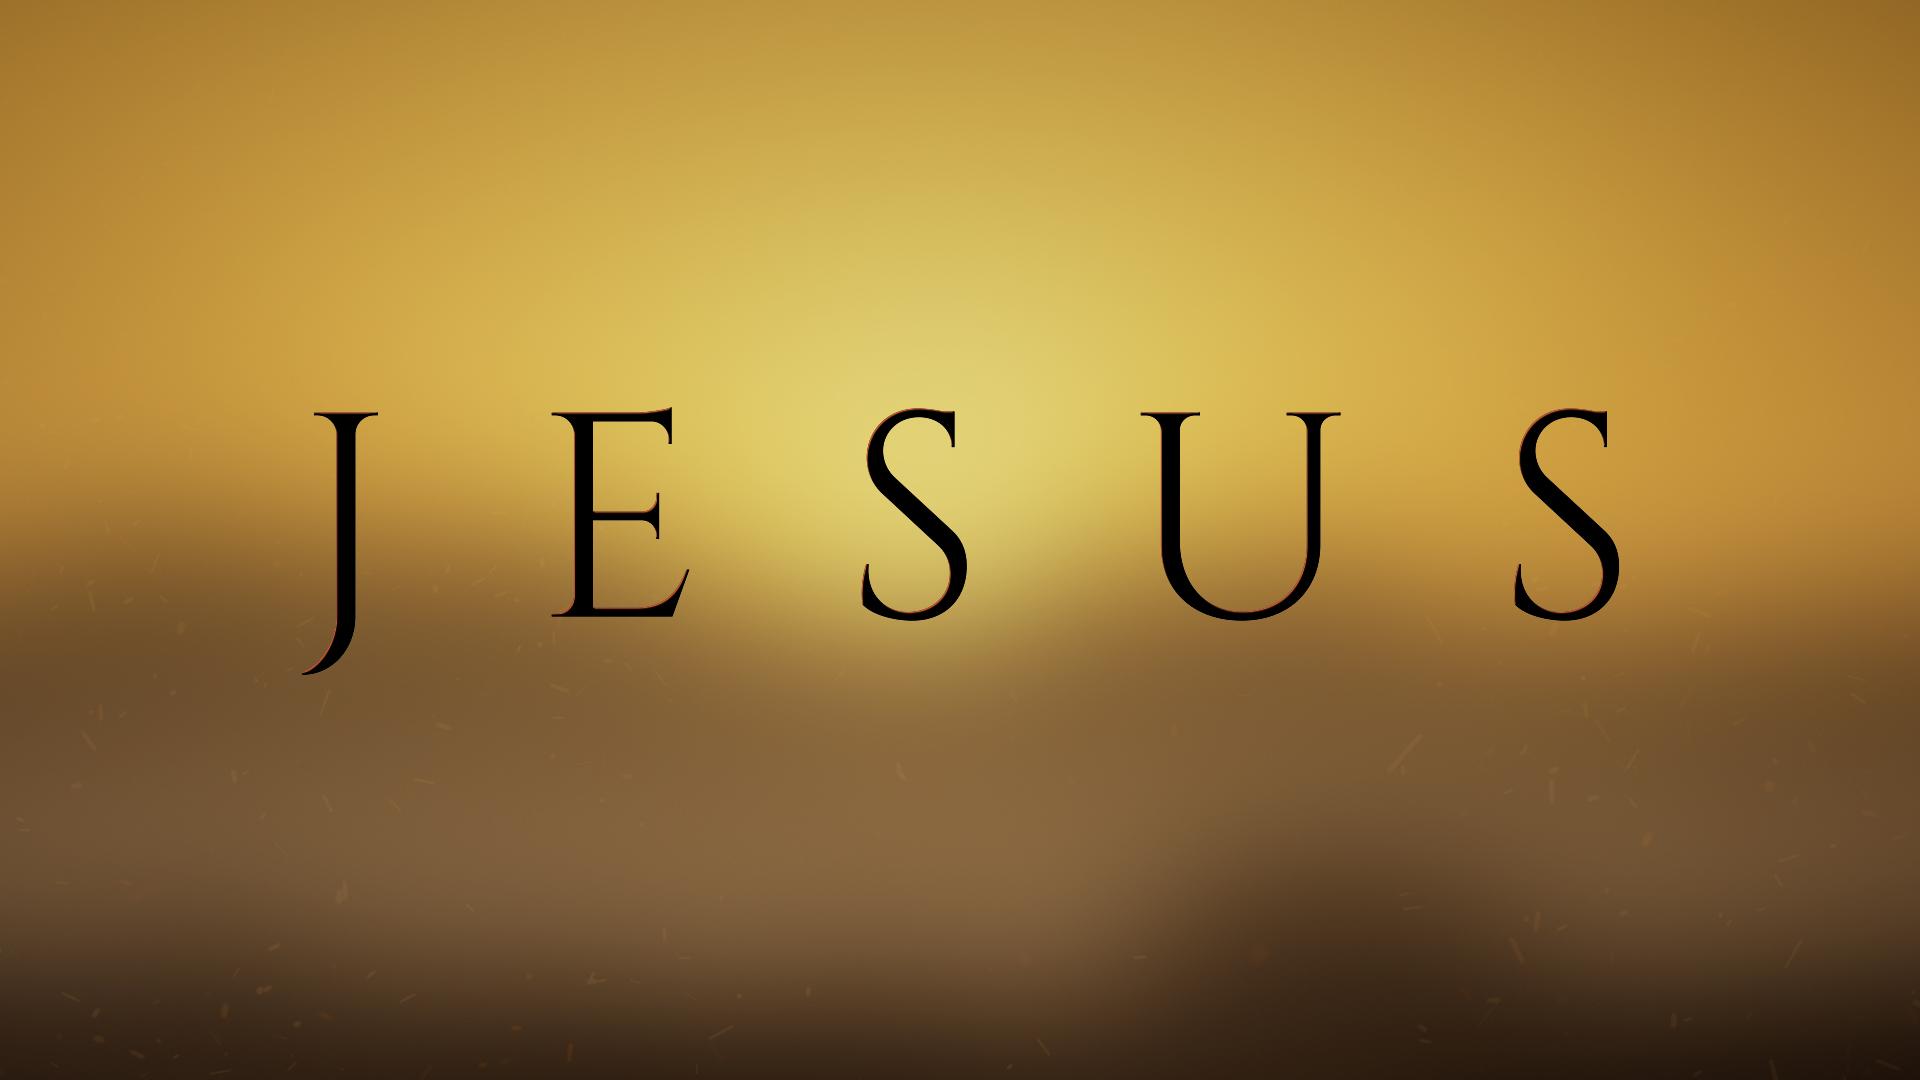 Novela Jesus a nova trama bíblica da RecordTV